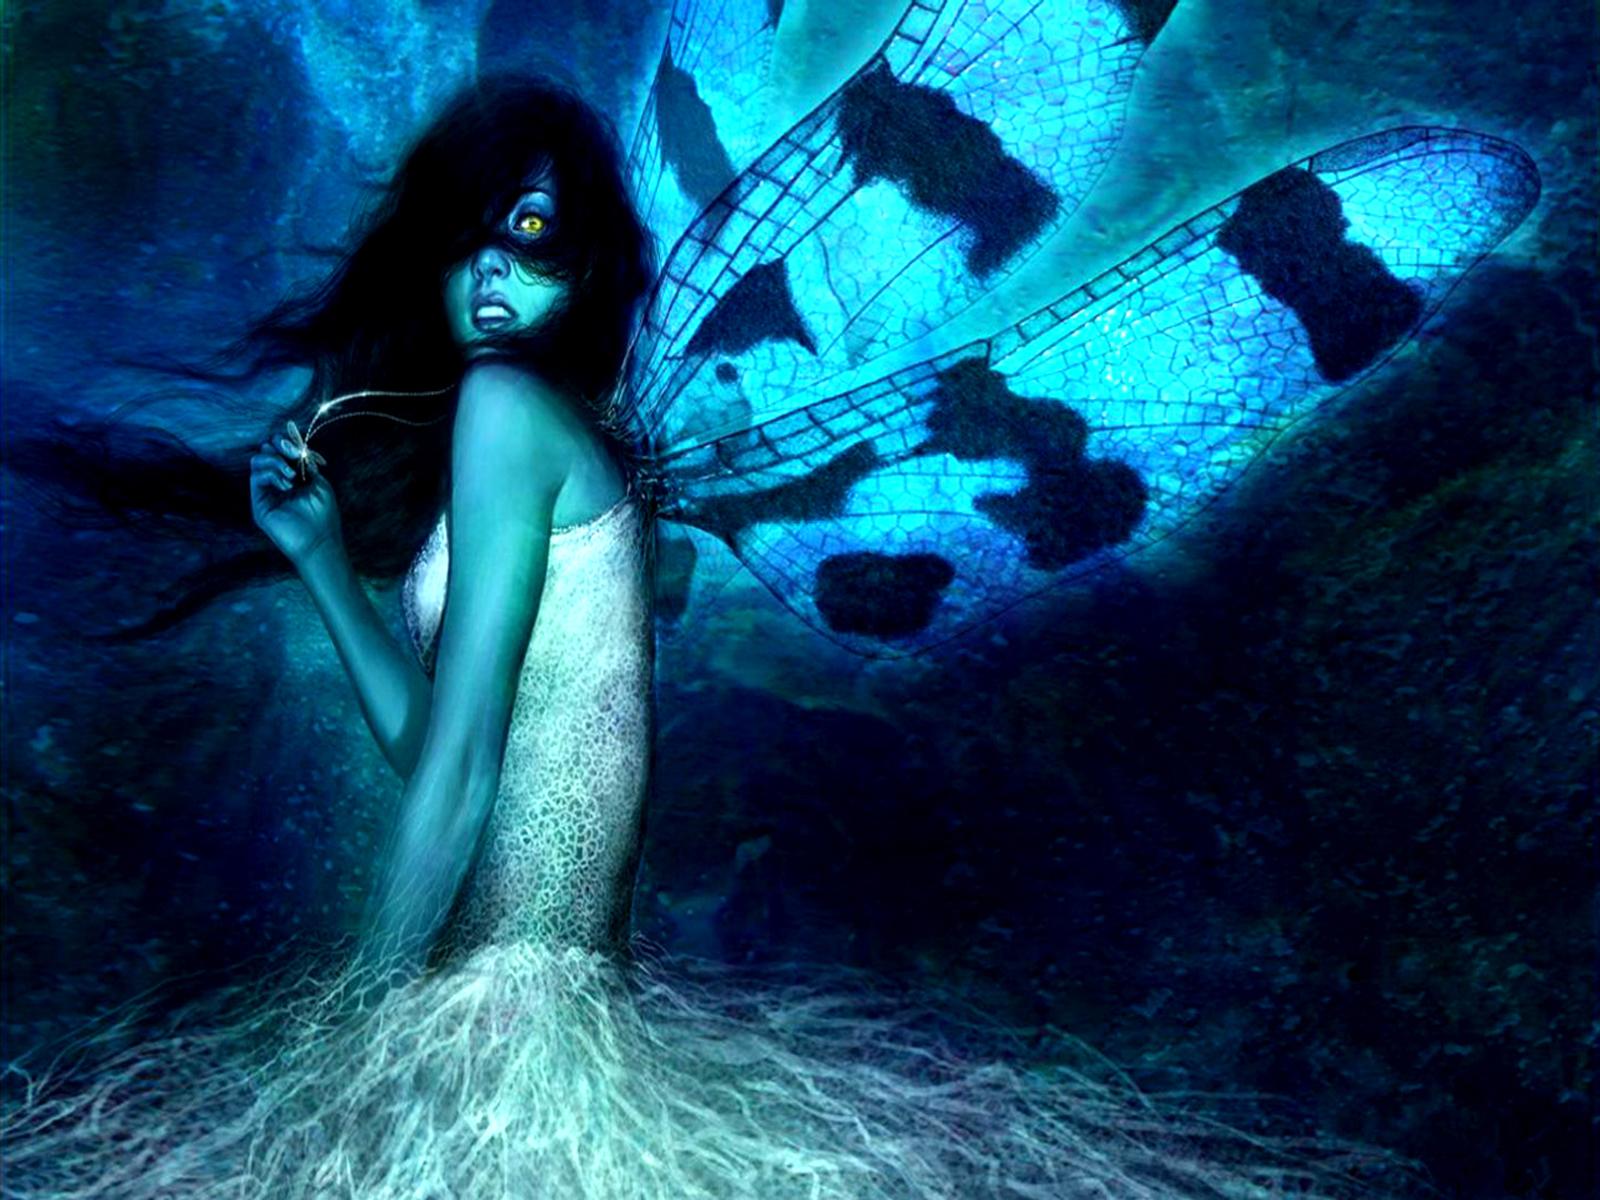 vampire fairy wallpaper backgrounds - photo #42